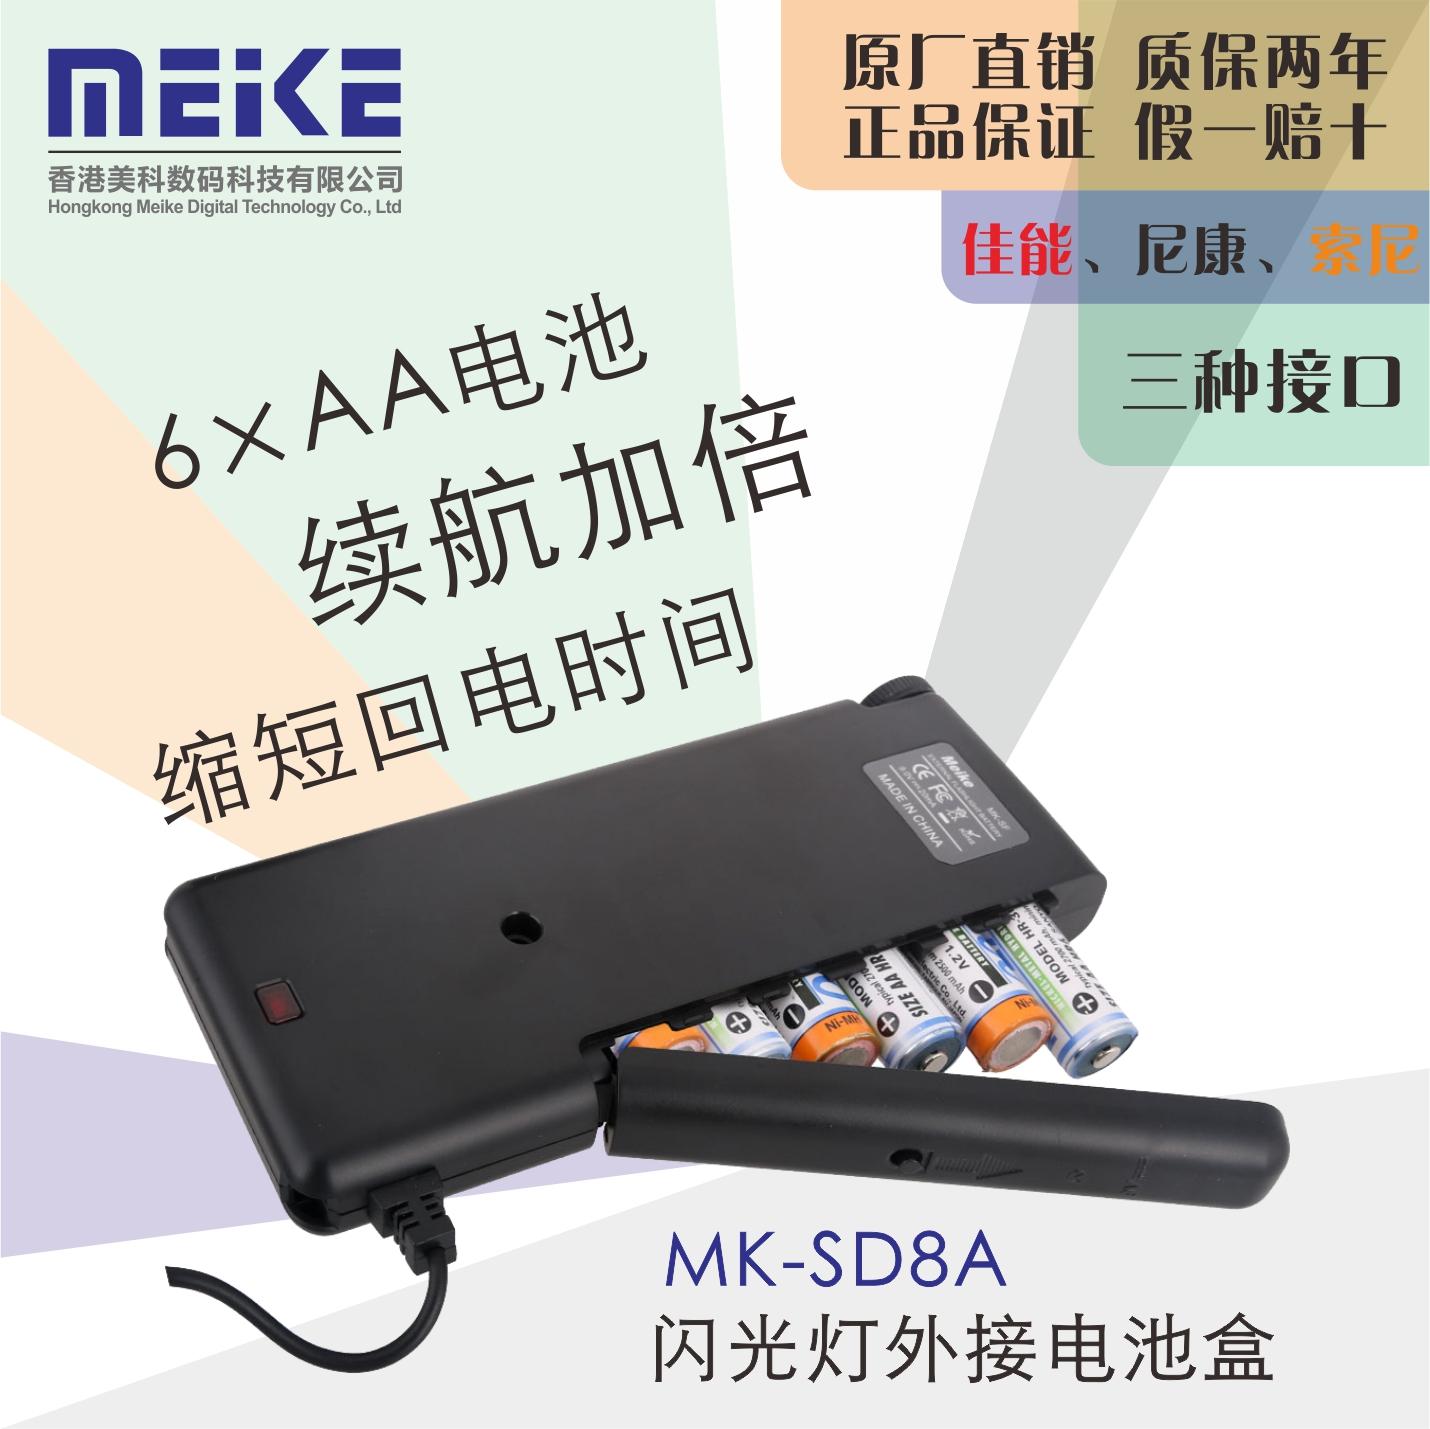 Аккумулятор для SLR-камеры Meike MK-SD8A meike mk xt2g metal hand grip for fujifilm x t2